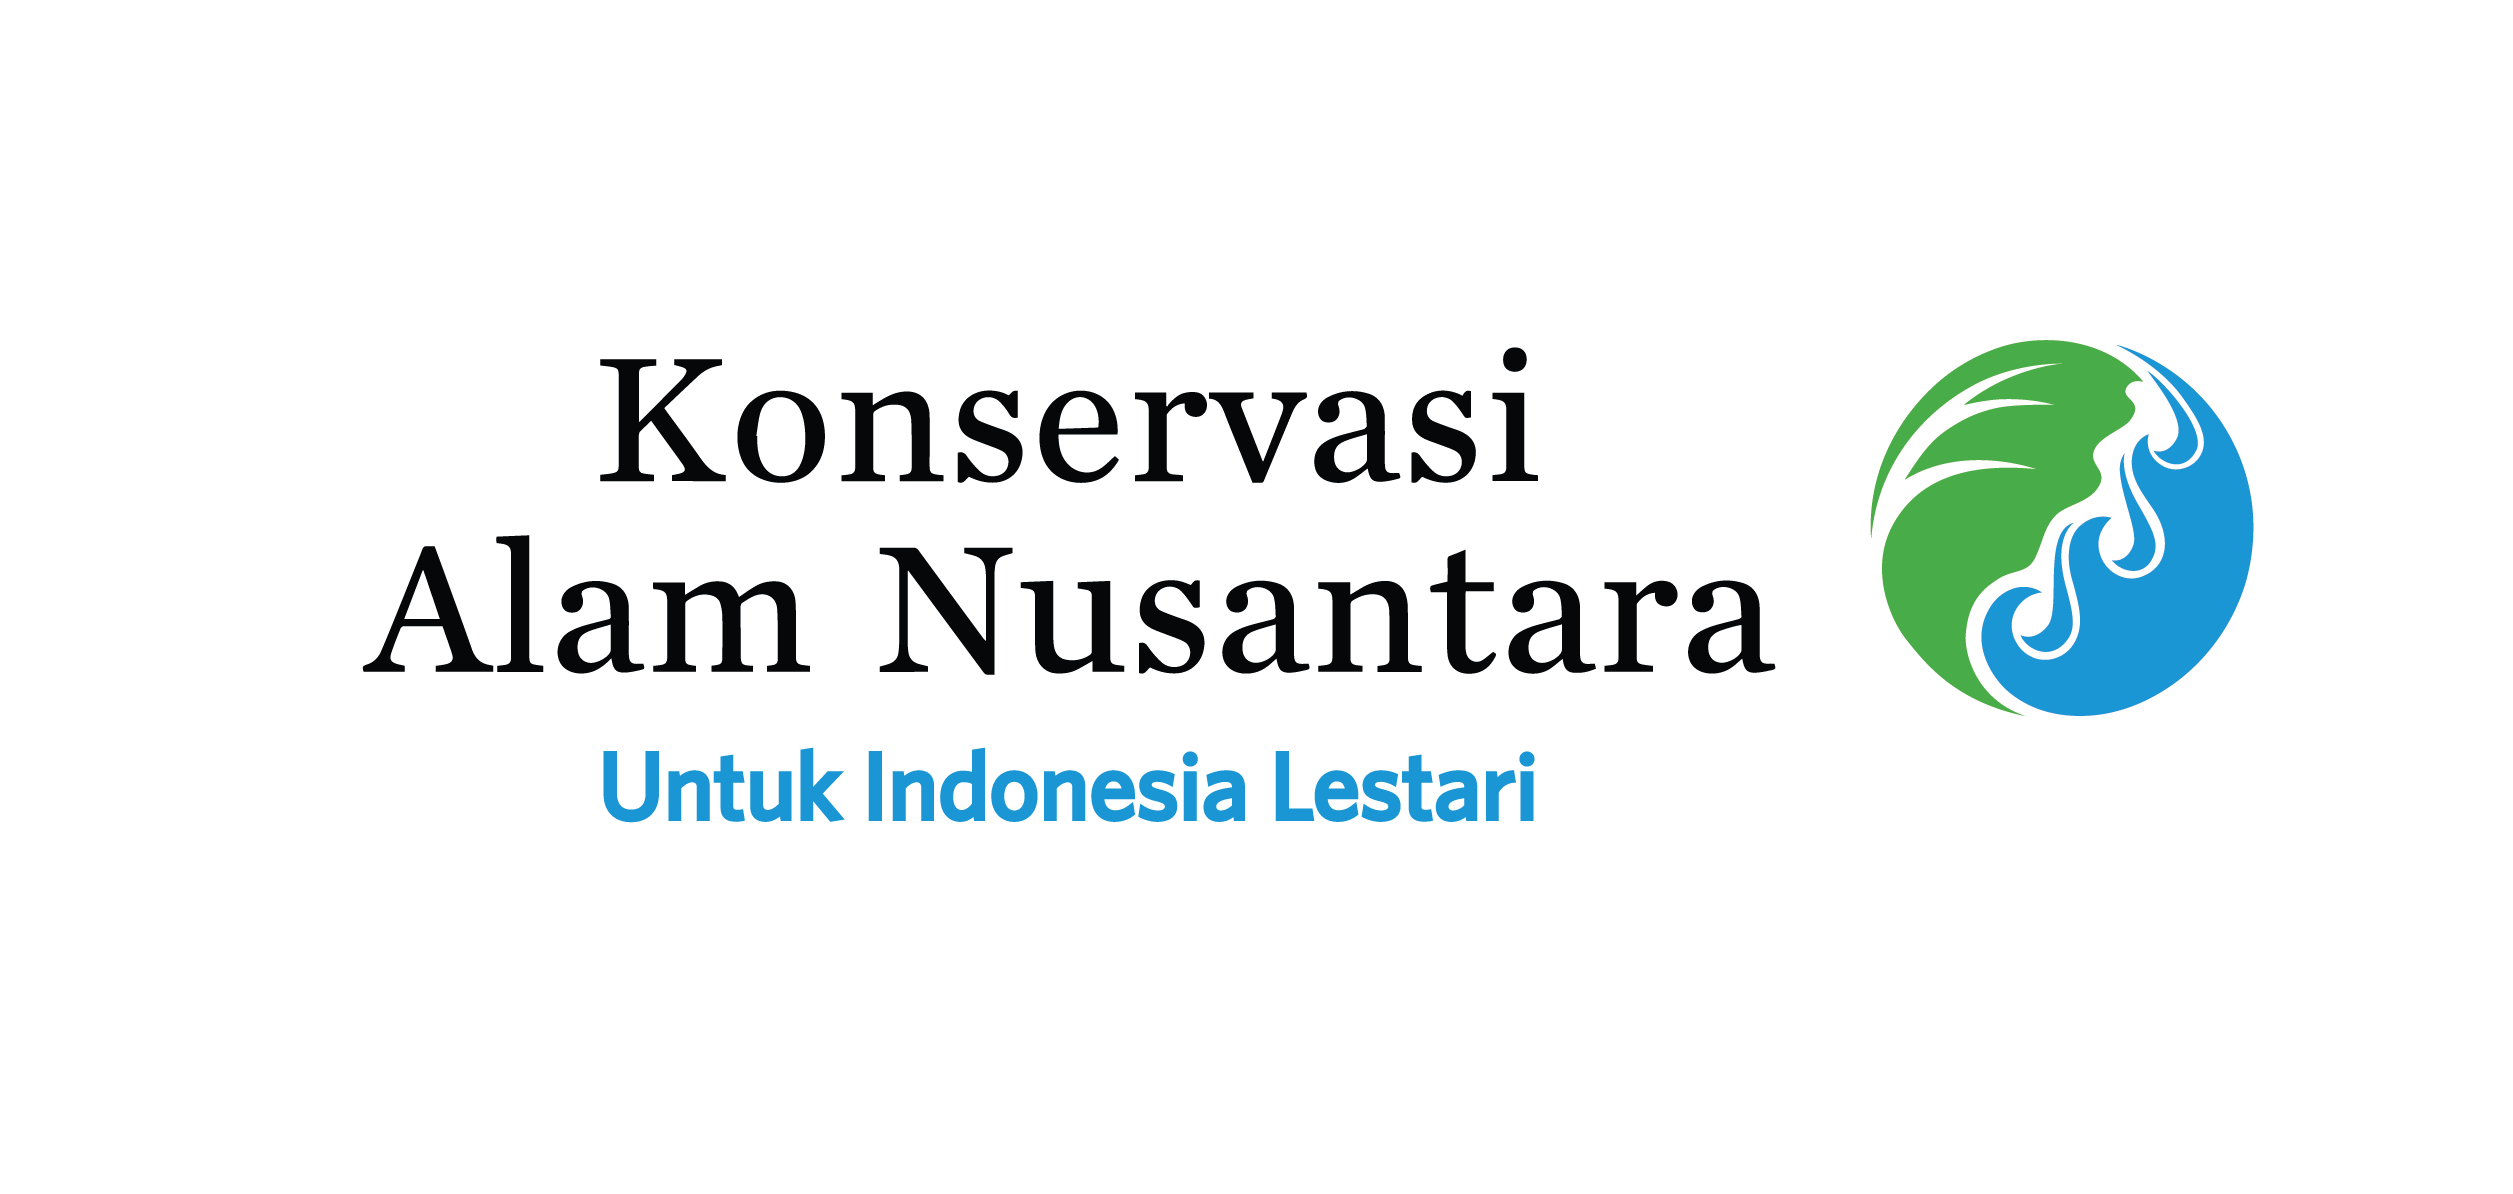 Yayasan Konservasi Alam Nusantara